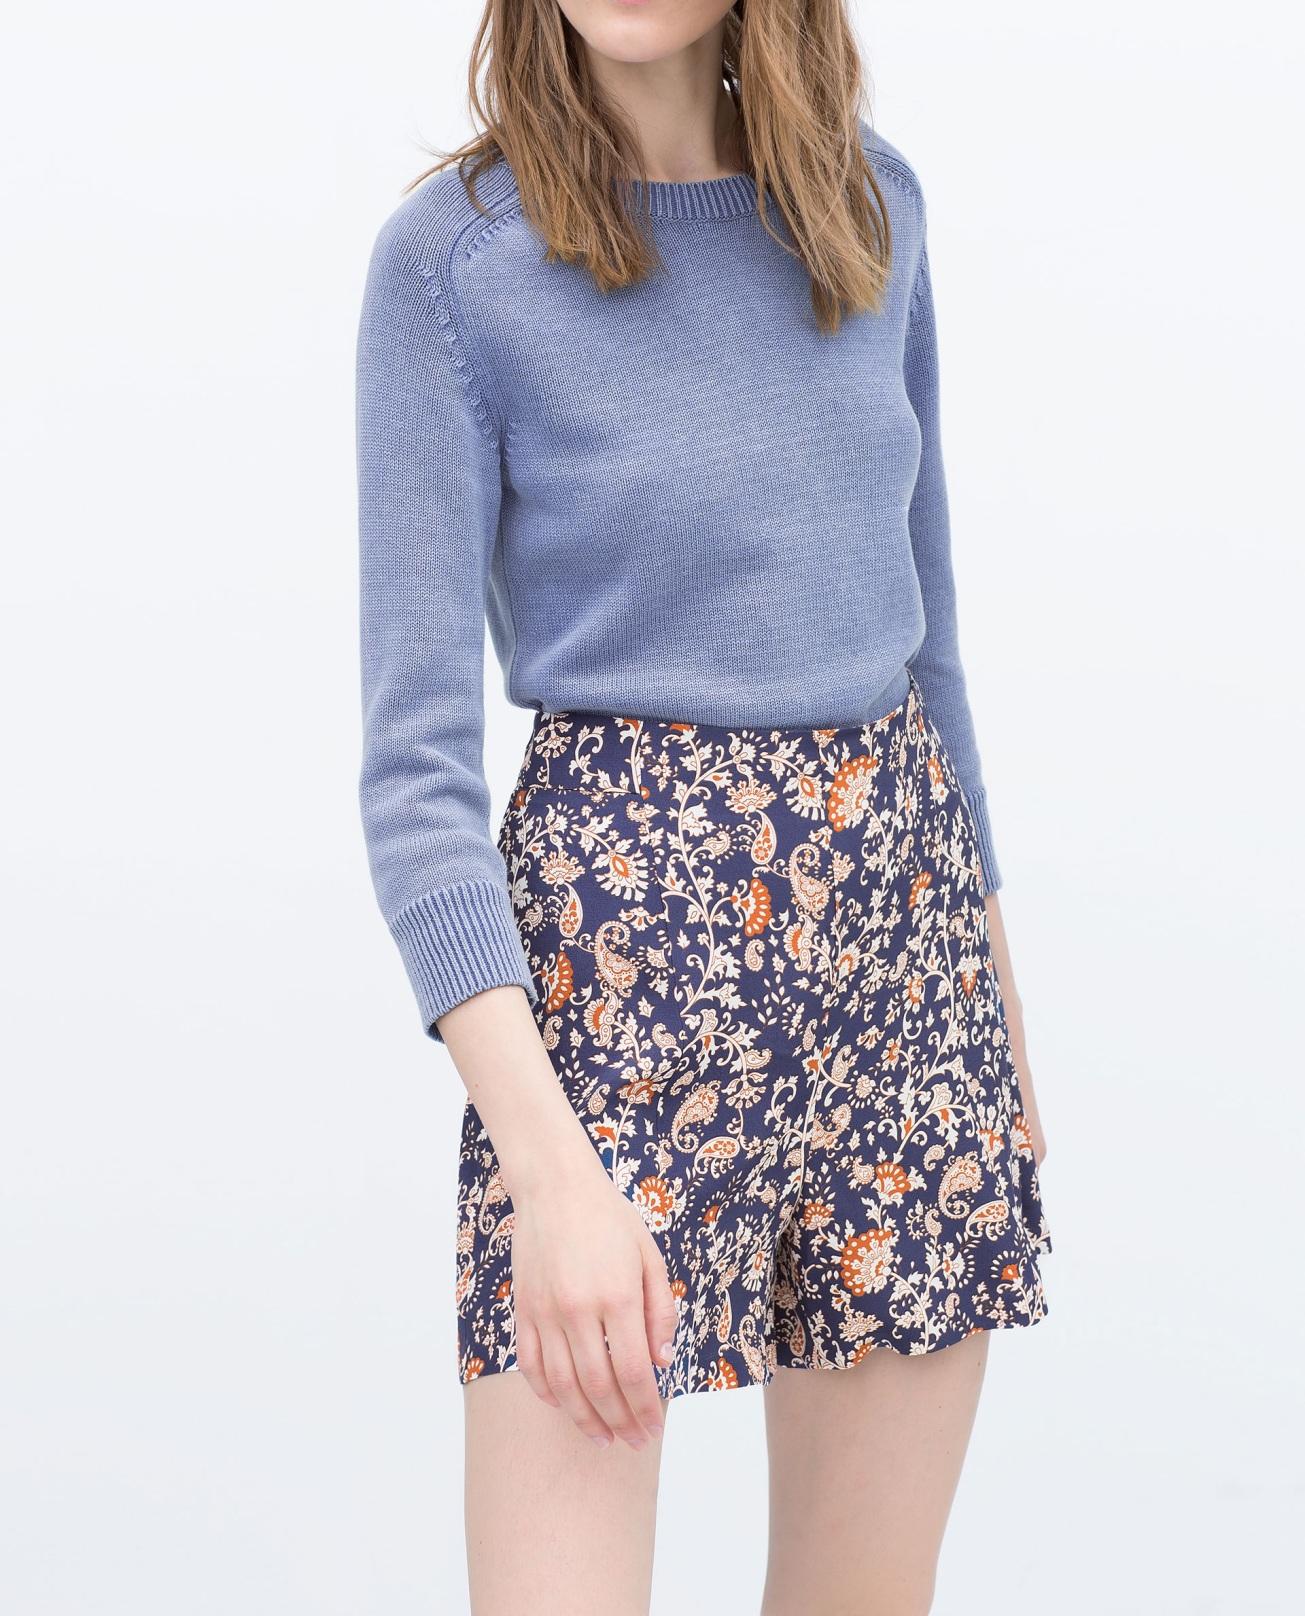 Printed Shorts, ZARA $49